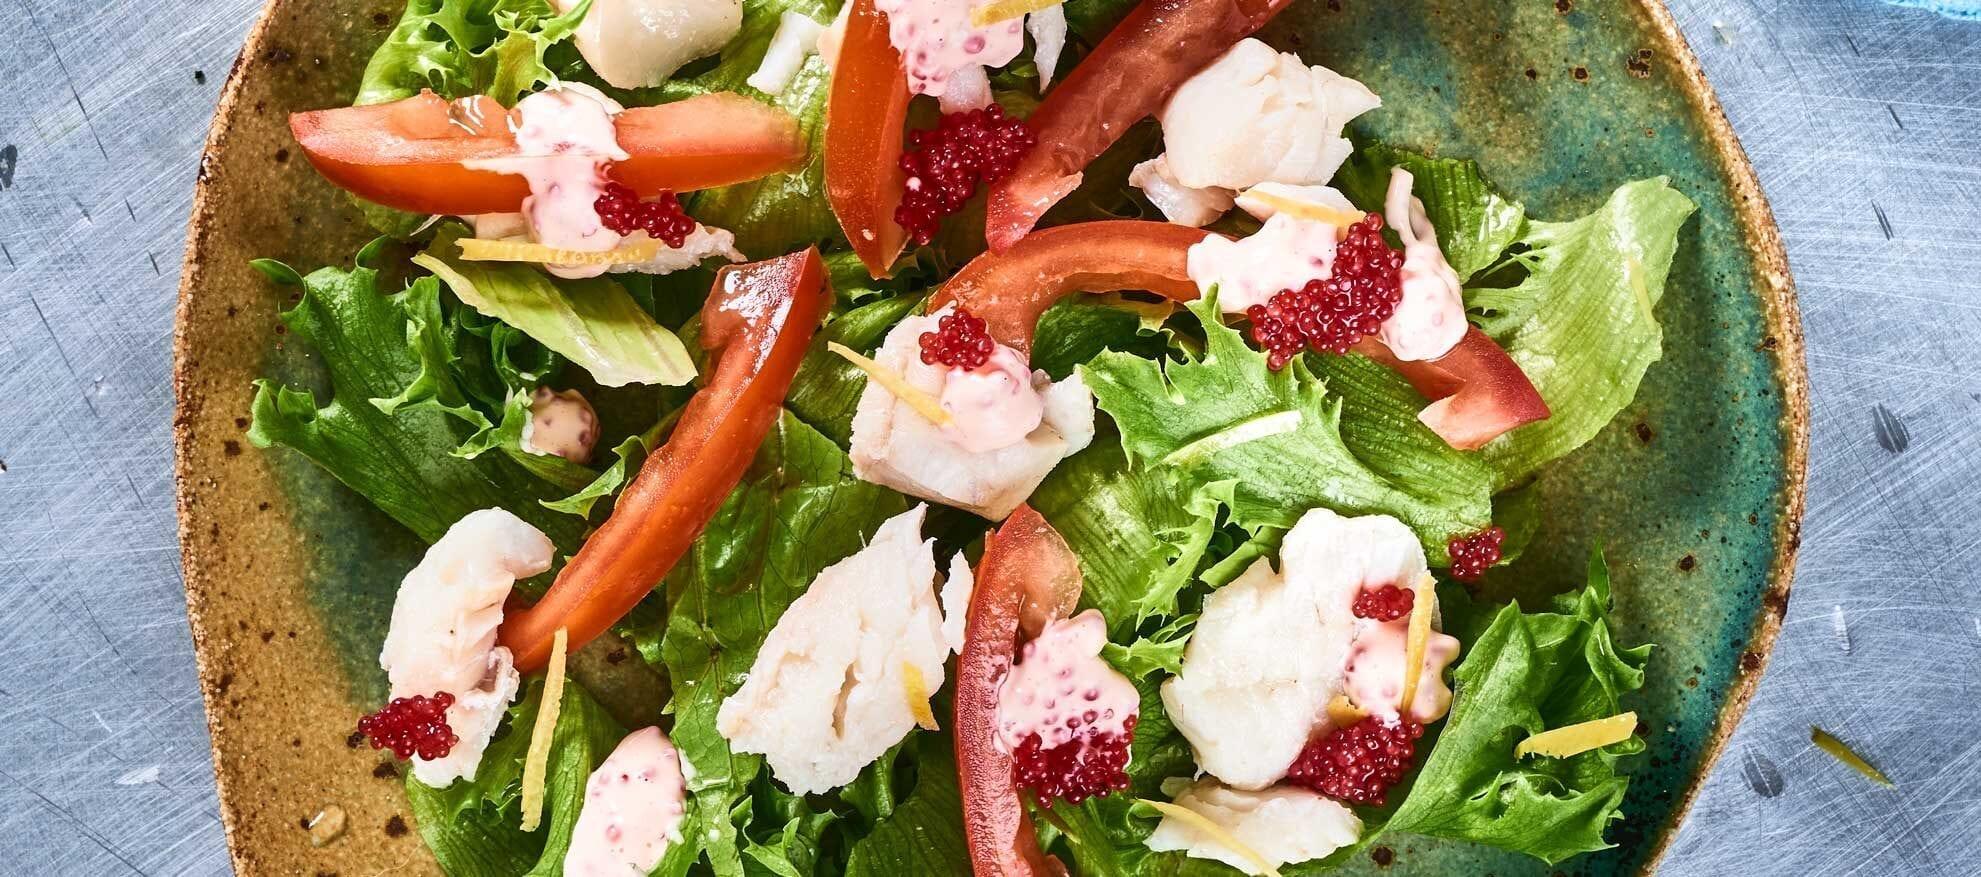 Groen salat torsk og stenbiderrogn